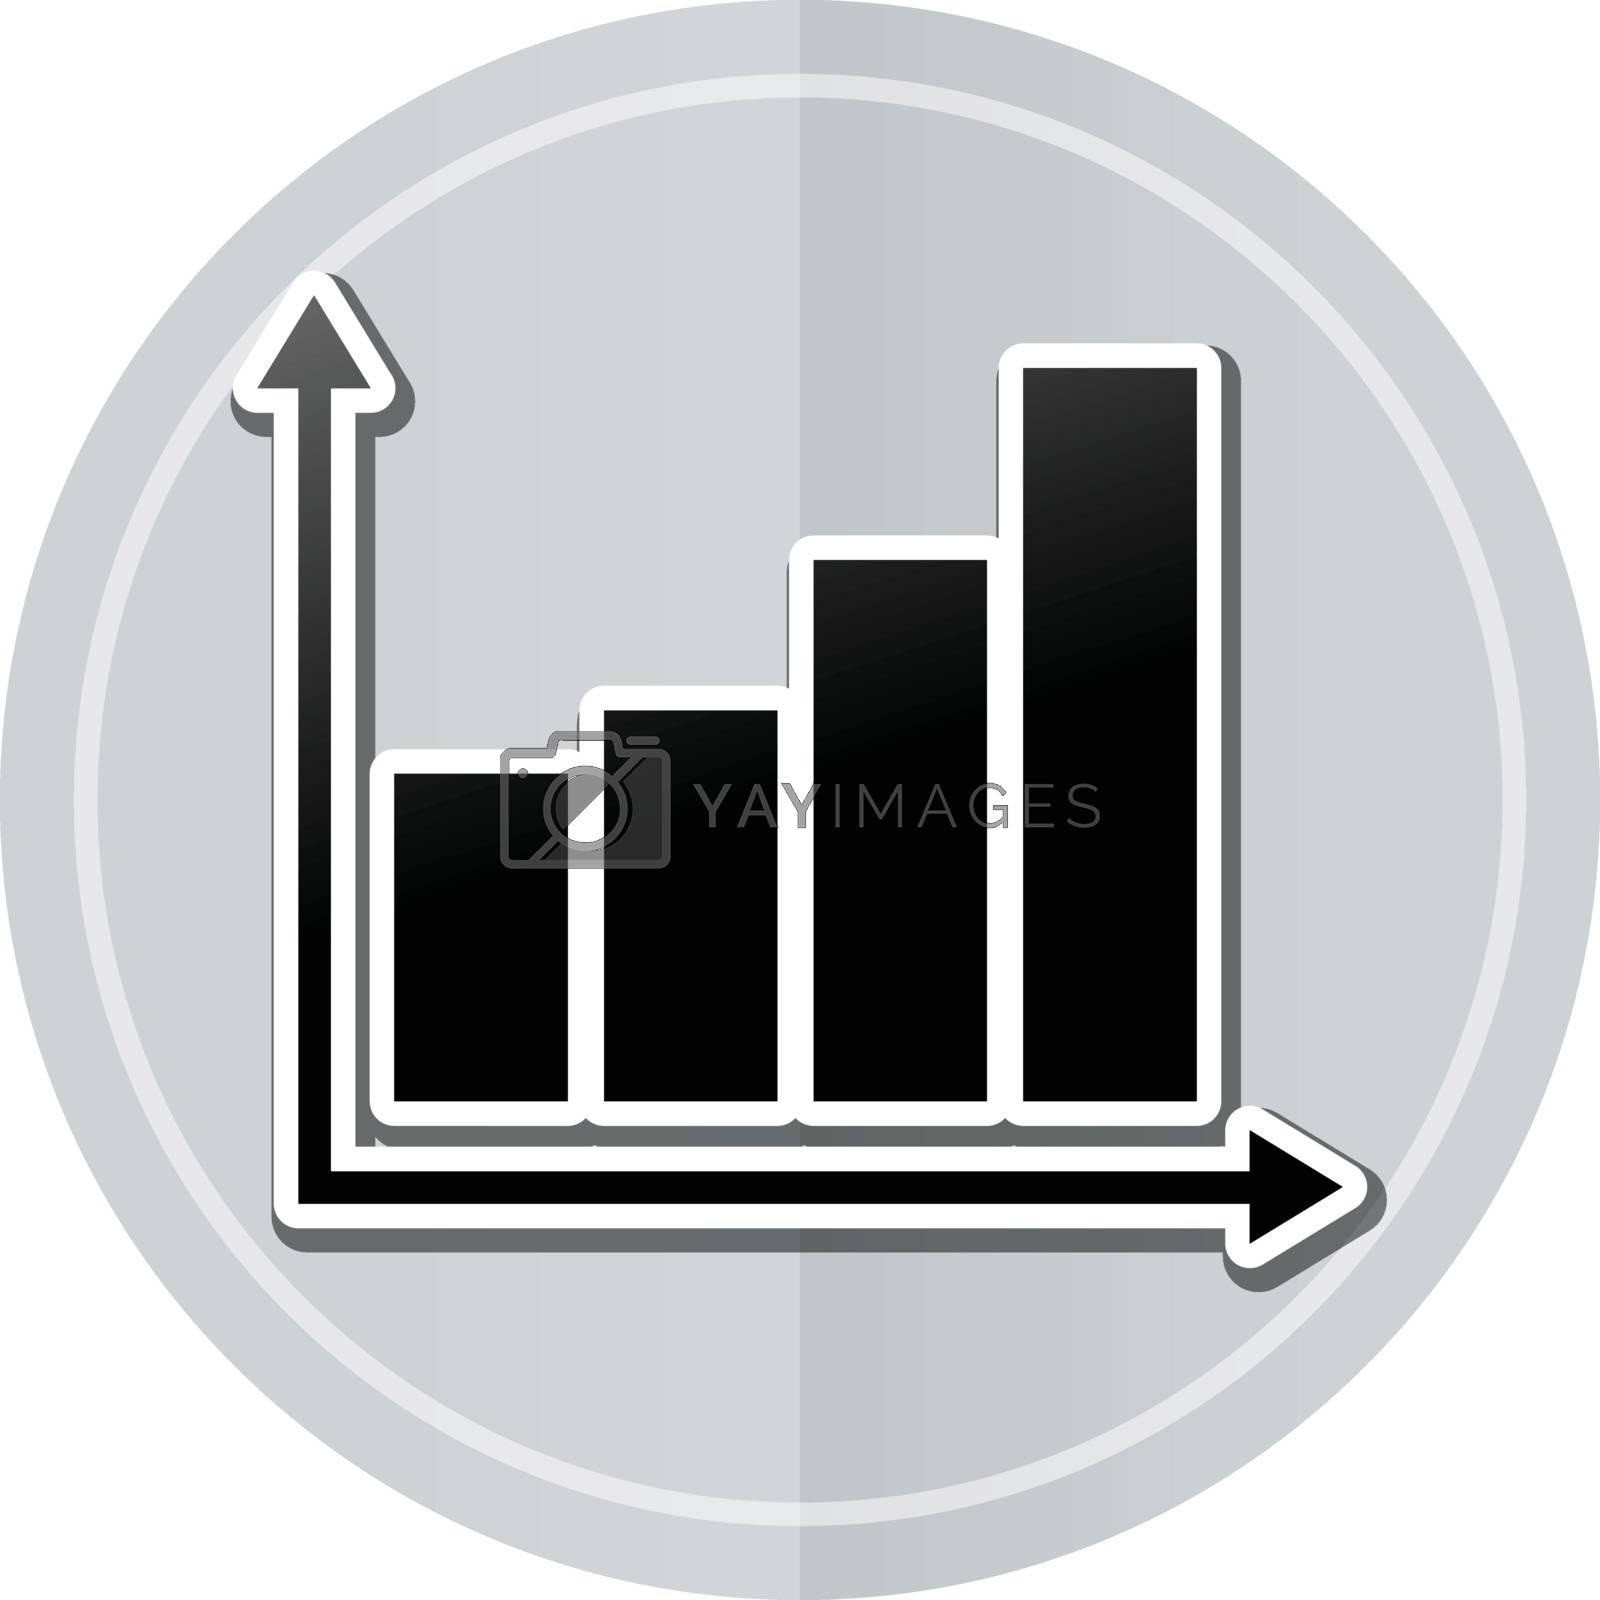 Illustration of graph sticker icon simple design